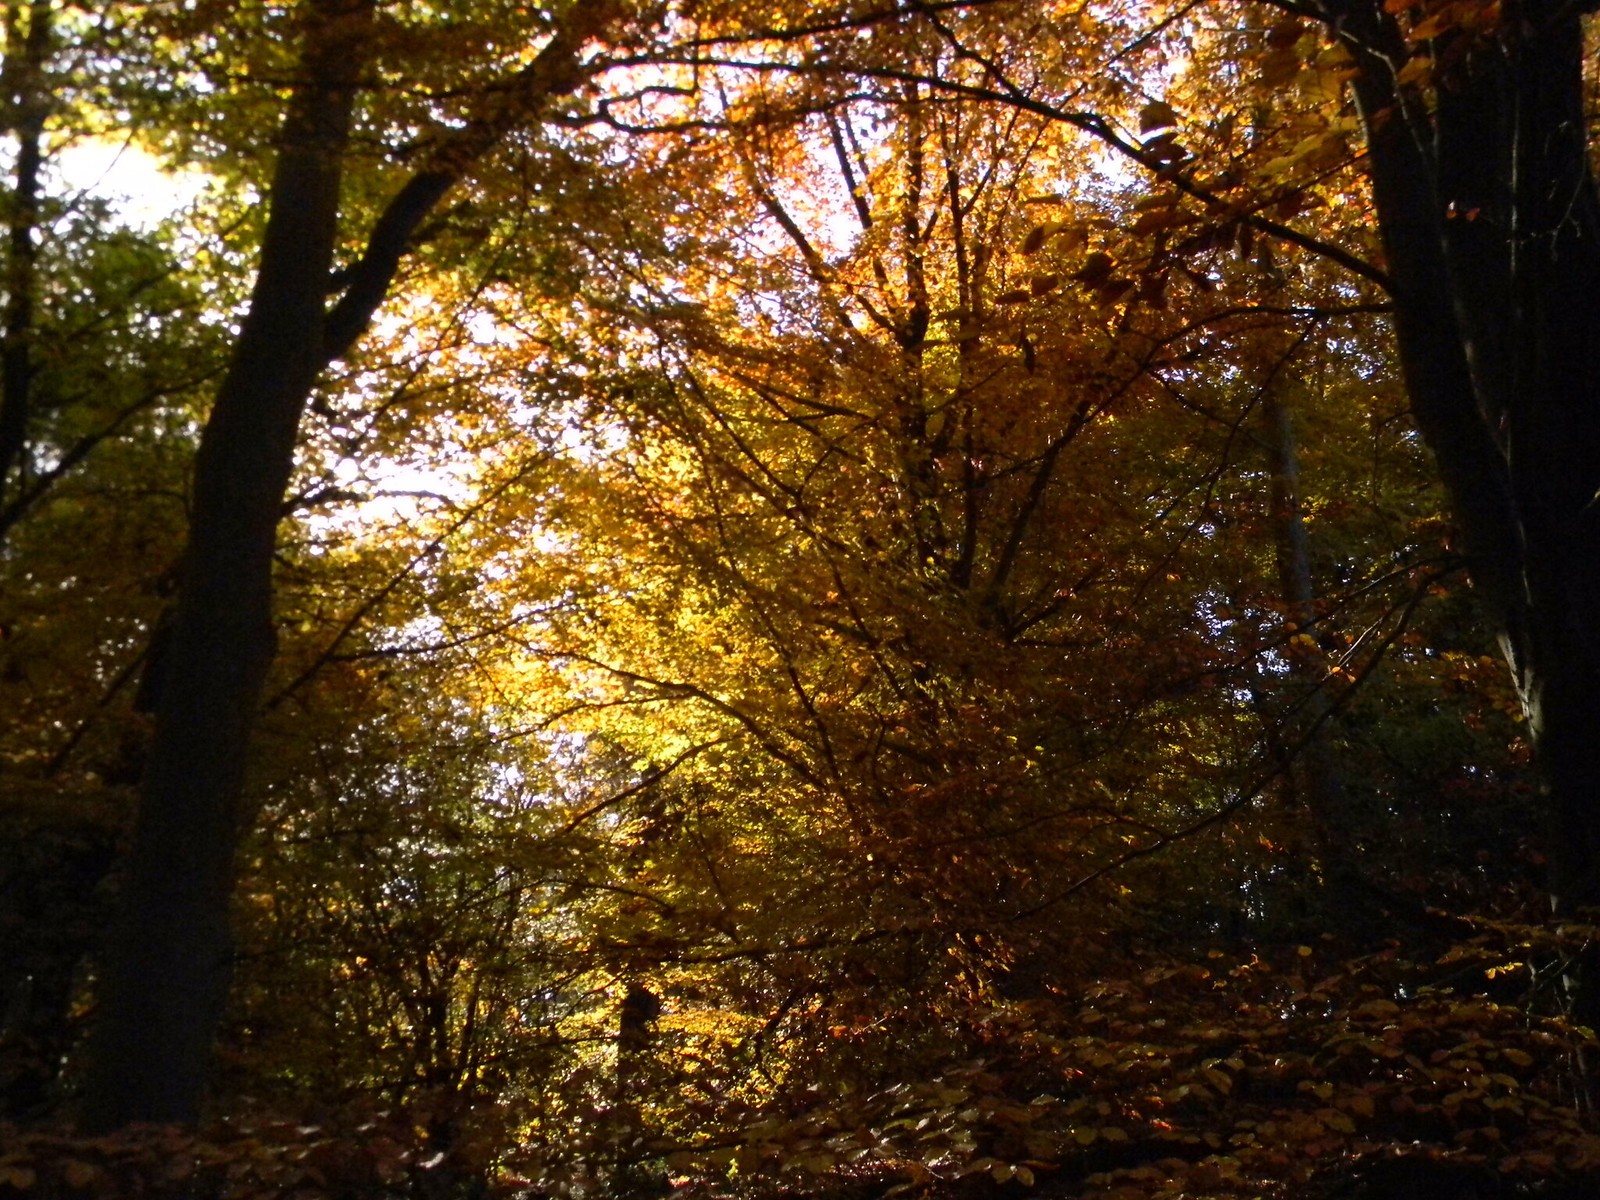 Autumn colours Crowthorne to Sandhurst (avoiding Eversley)